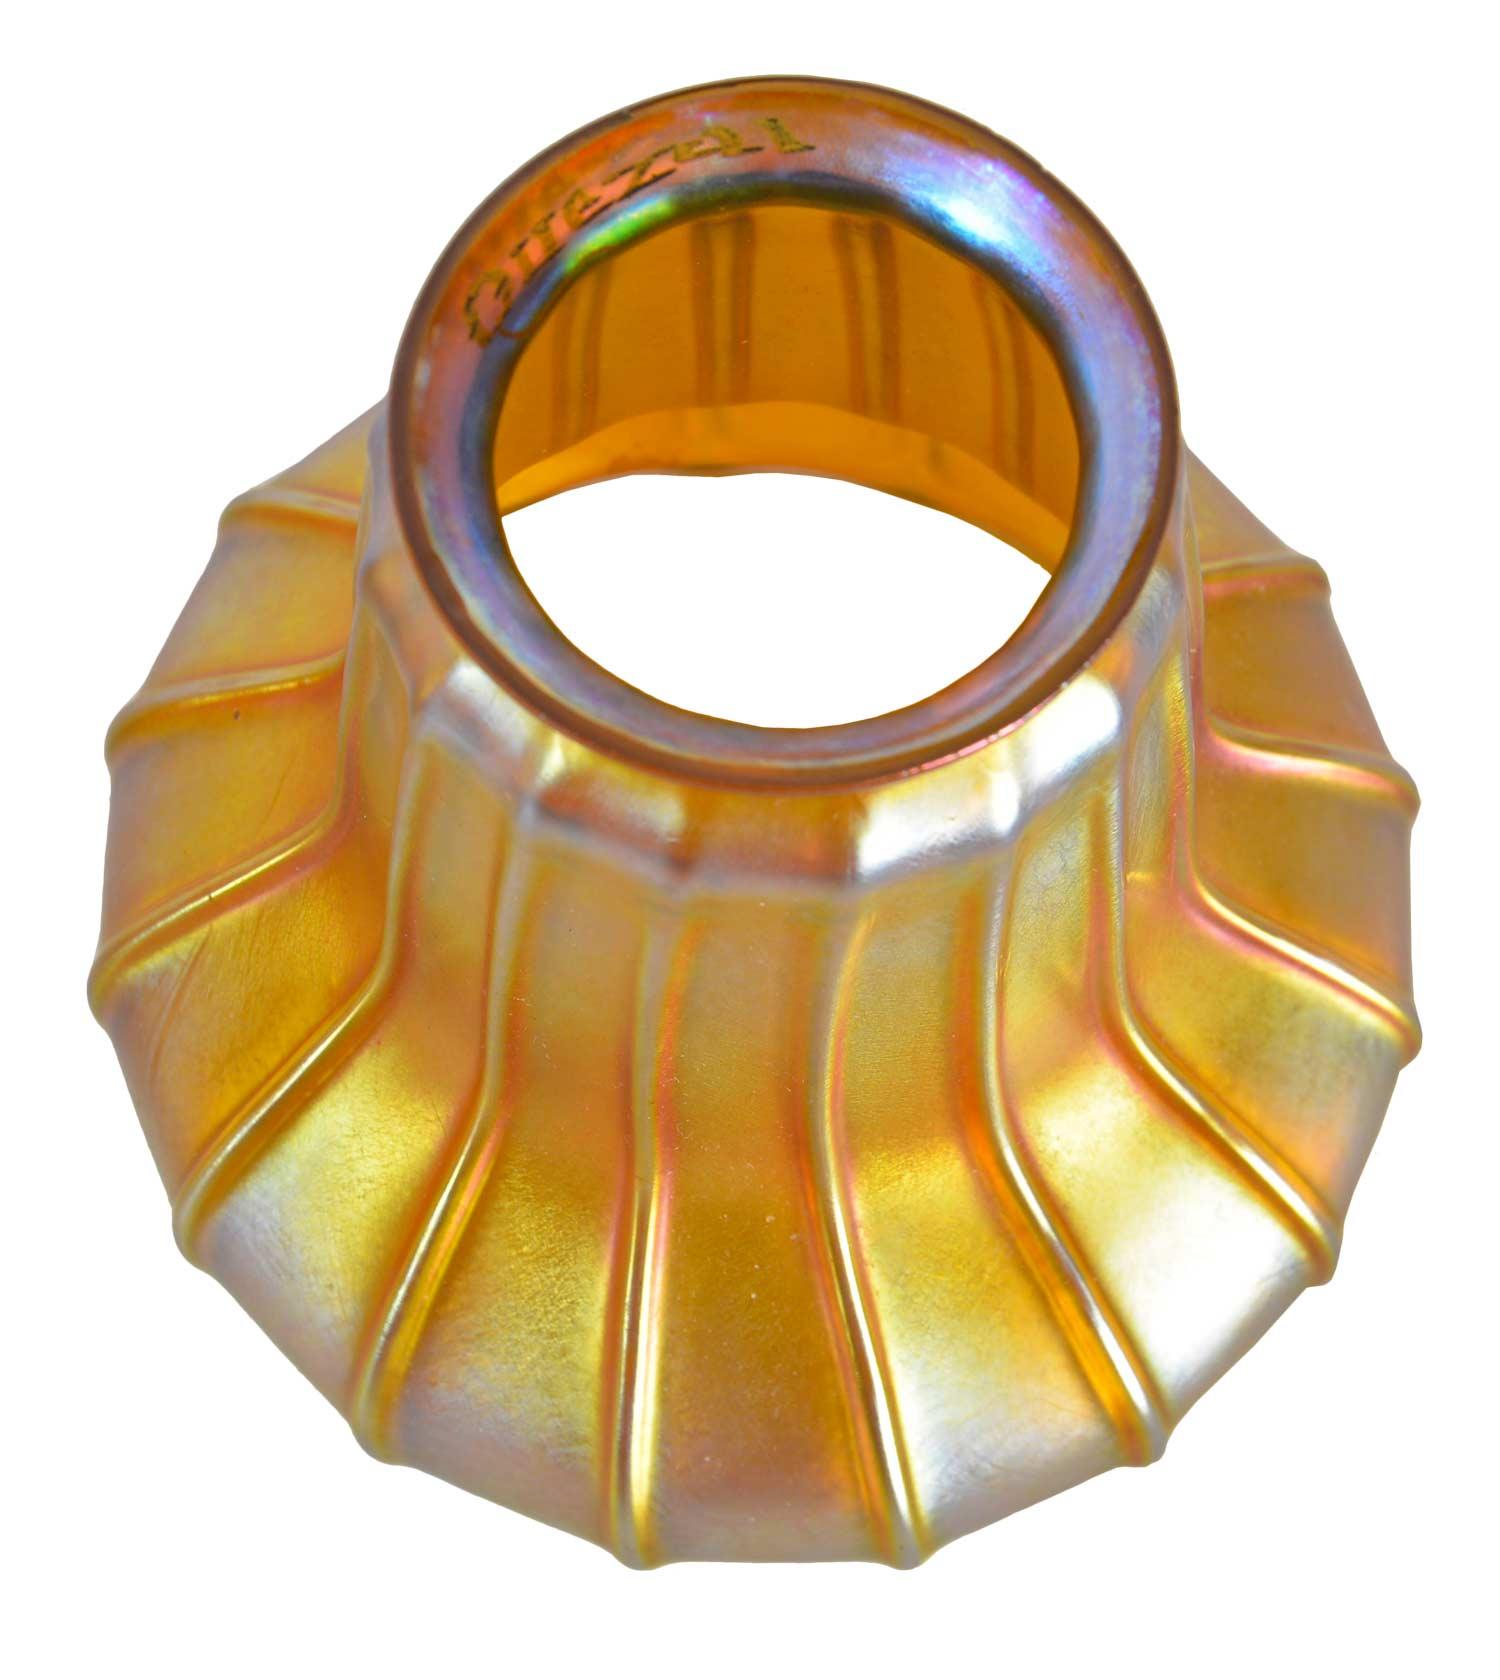 46192-gold-aurene-quezal-shade-top.jpg